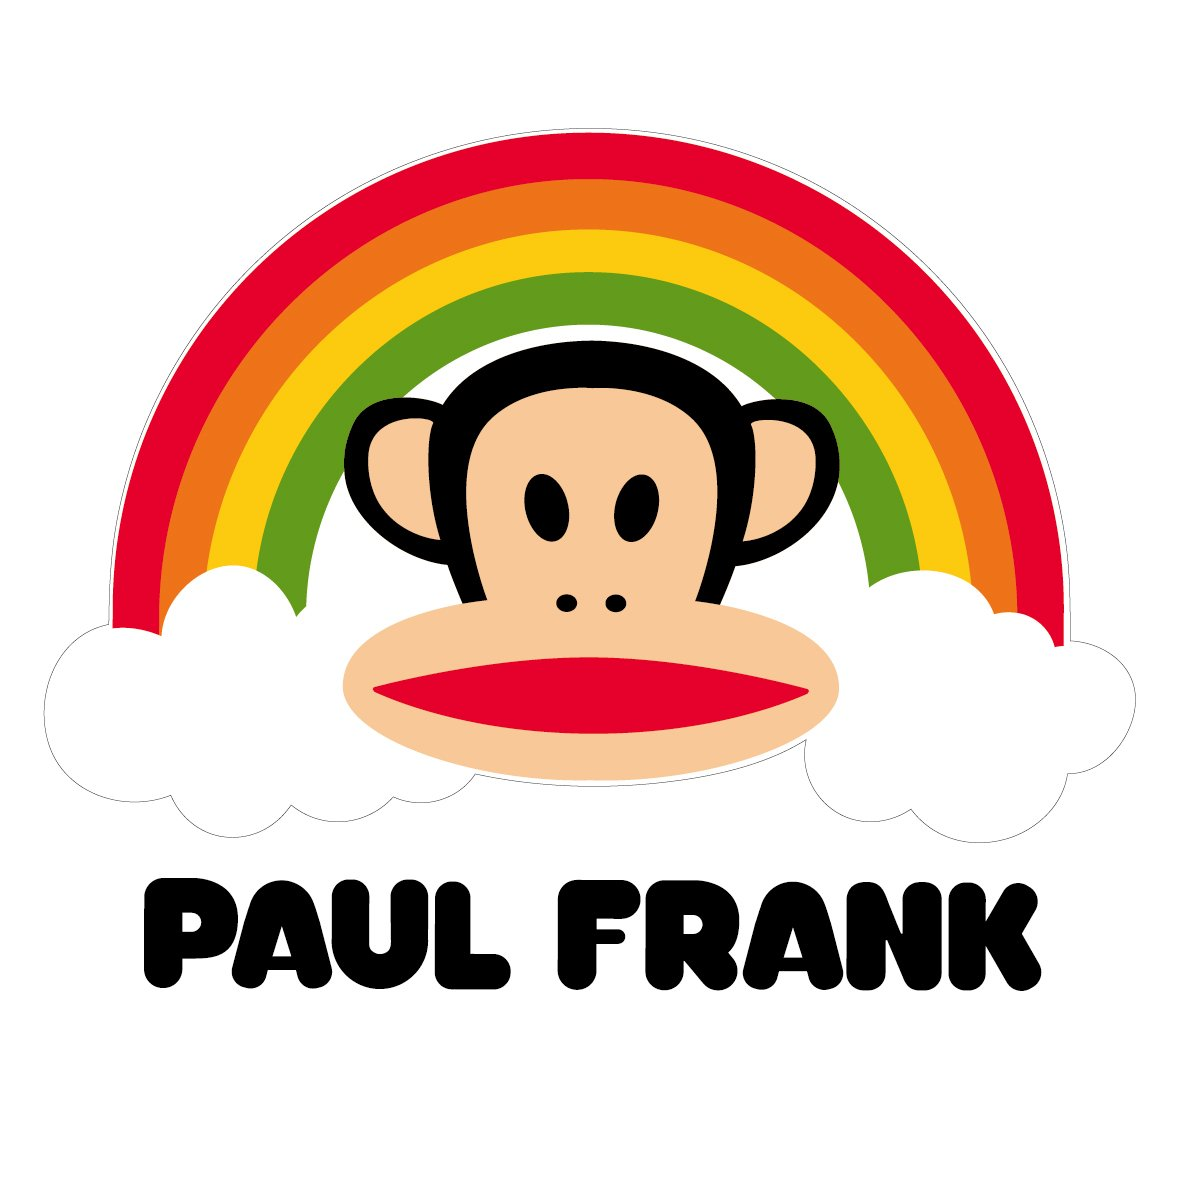 ky 卡艺 汽车贴纸 大嘴猴paulfrank 彩虹大嘴猴 搞笑可爱卡通 个性